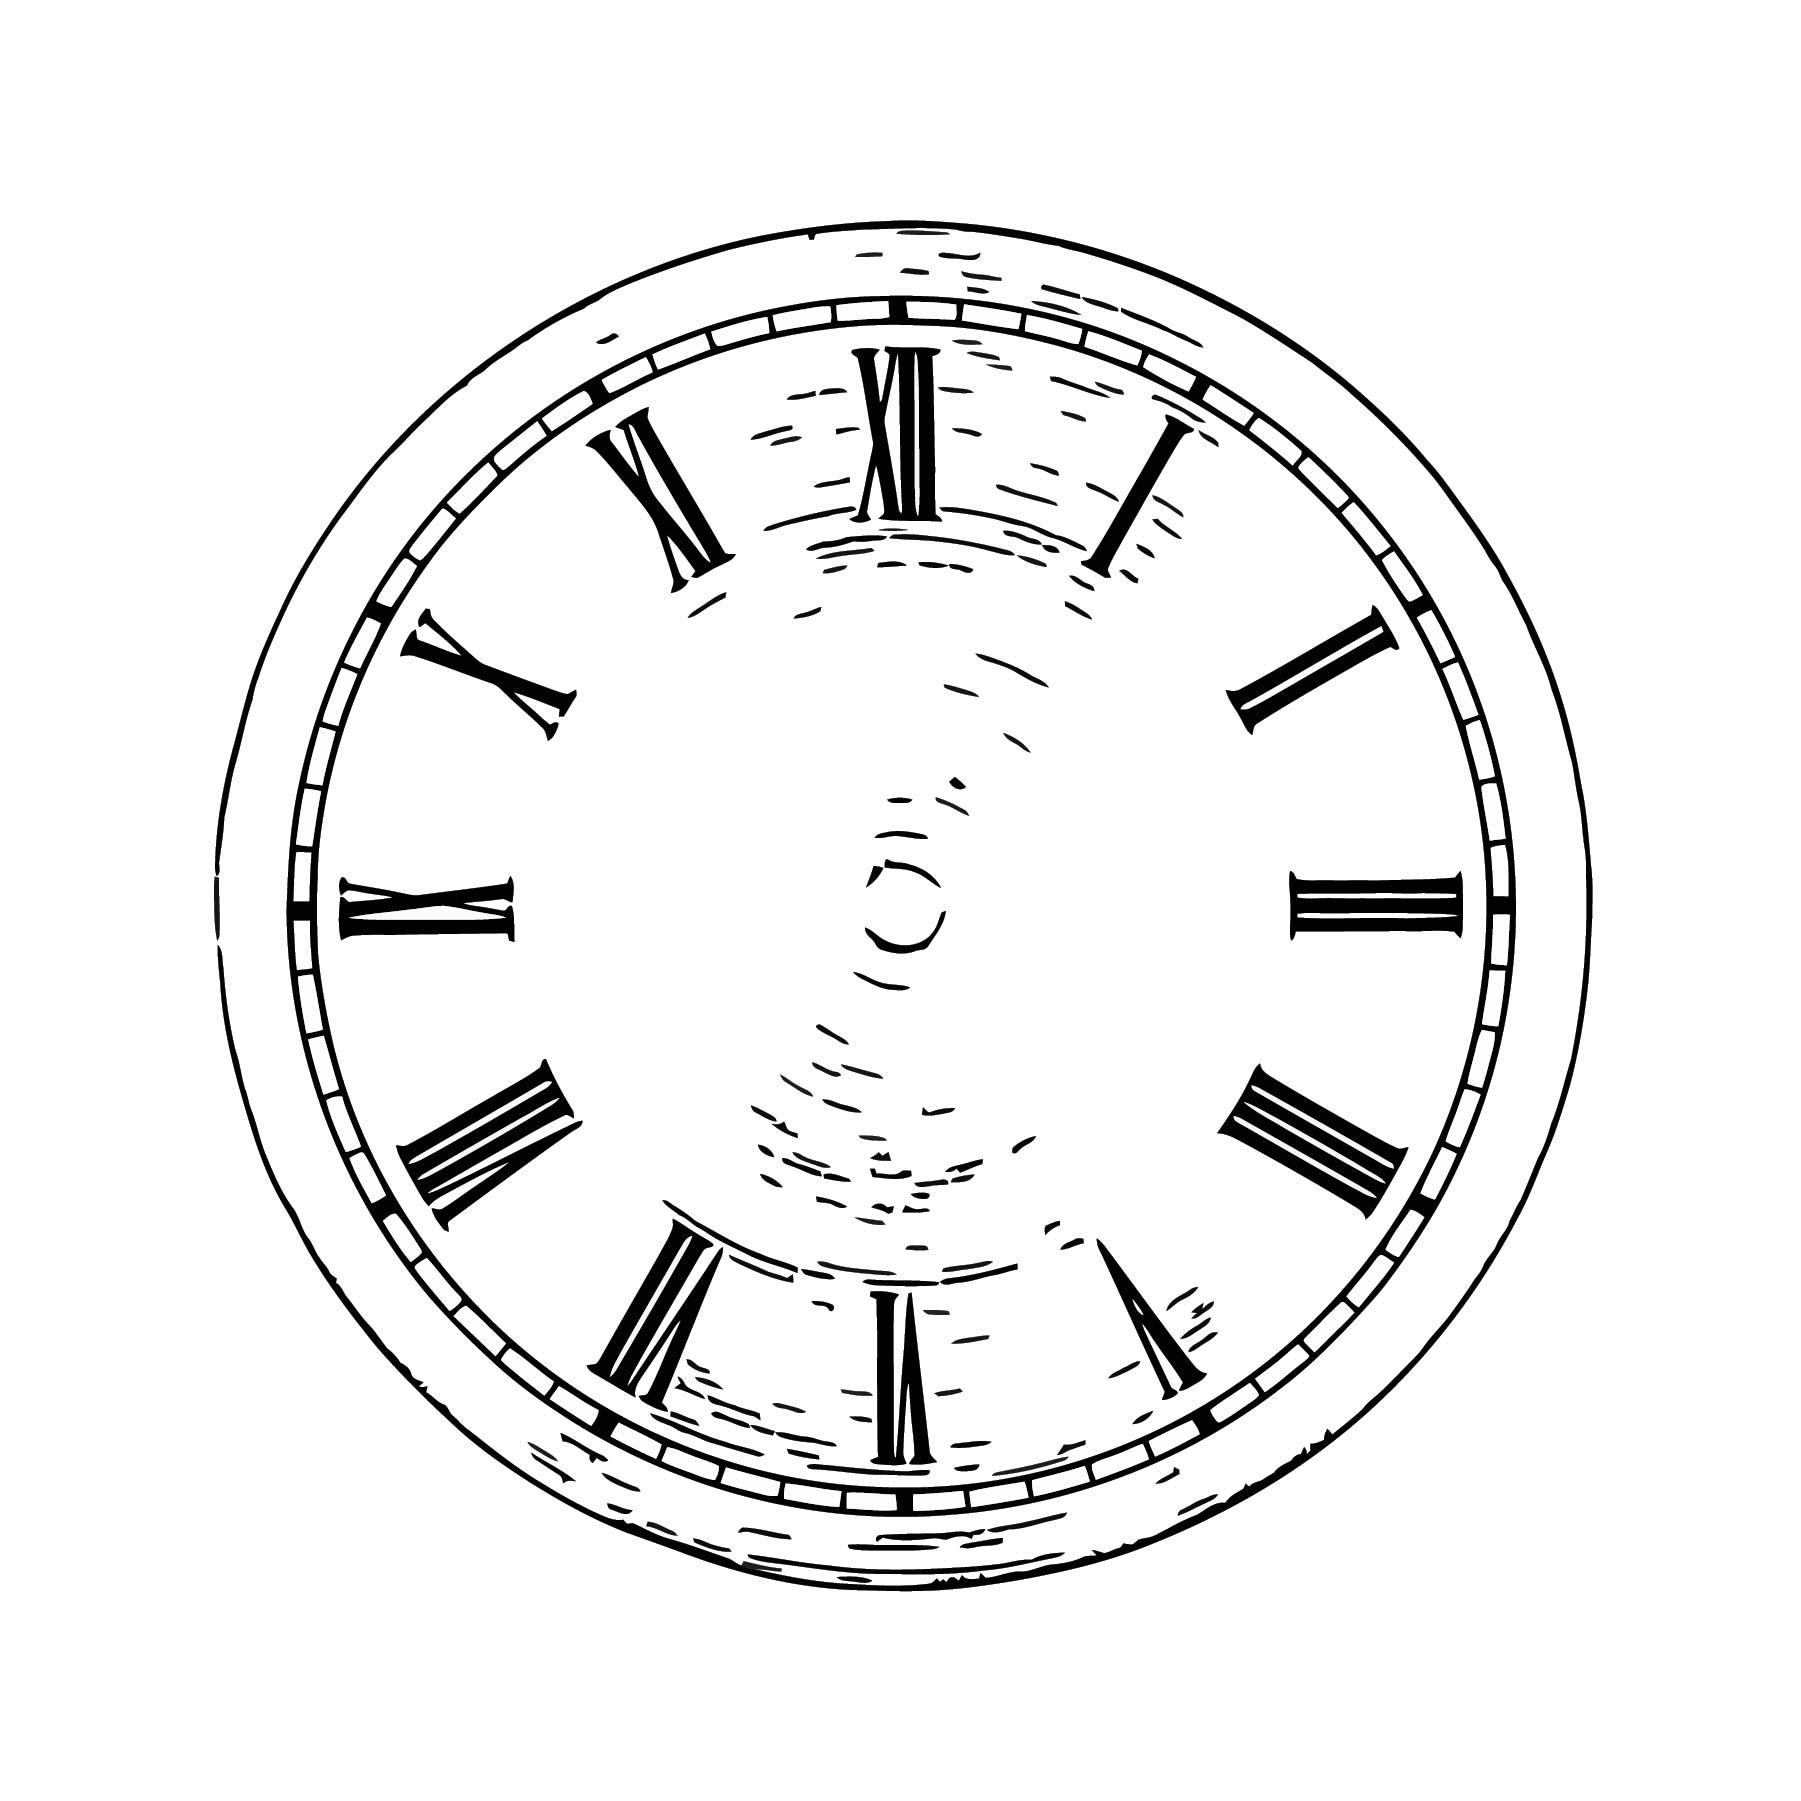 Dr412gr Quartz Clock Di Free Printable Al Cartoonized Free Printable Coloring Page